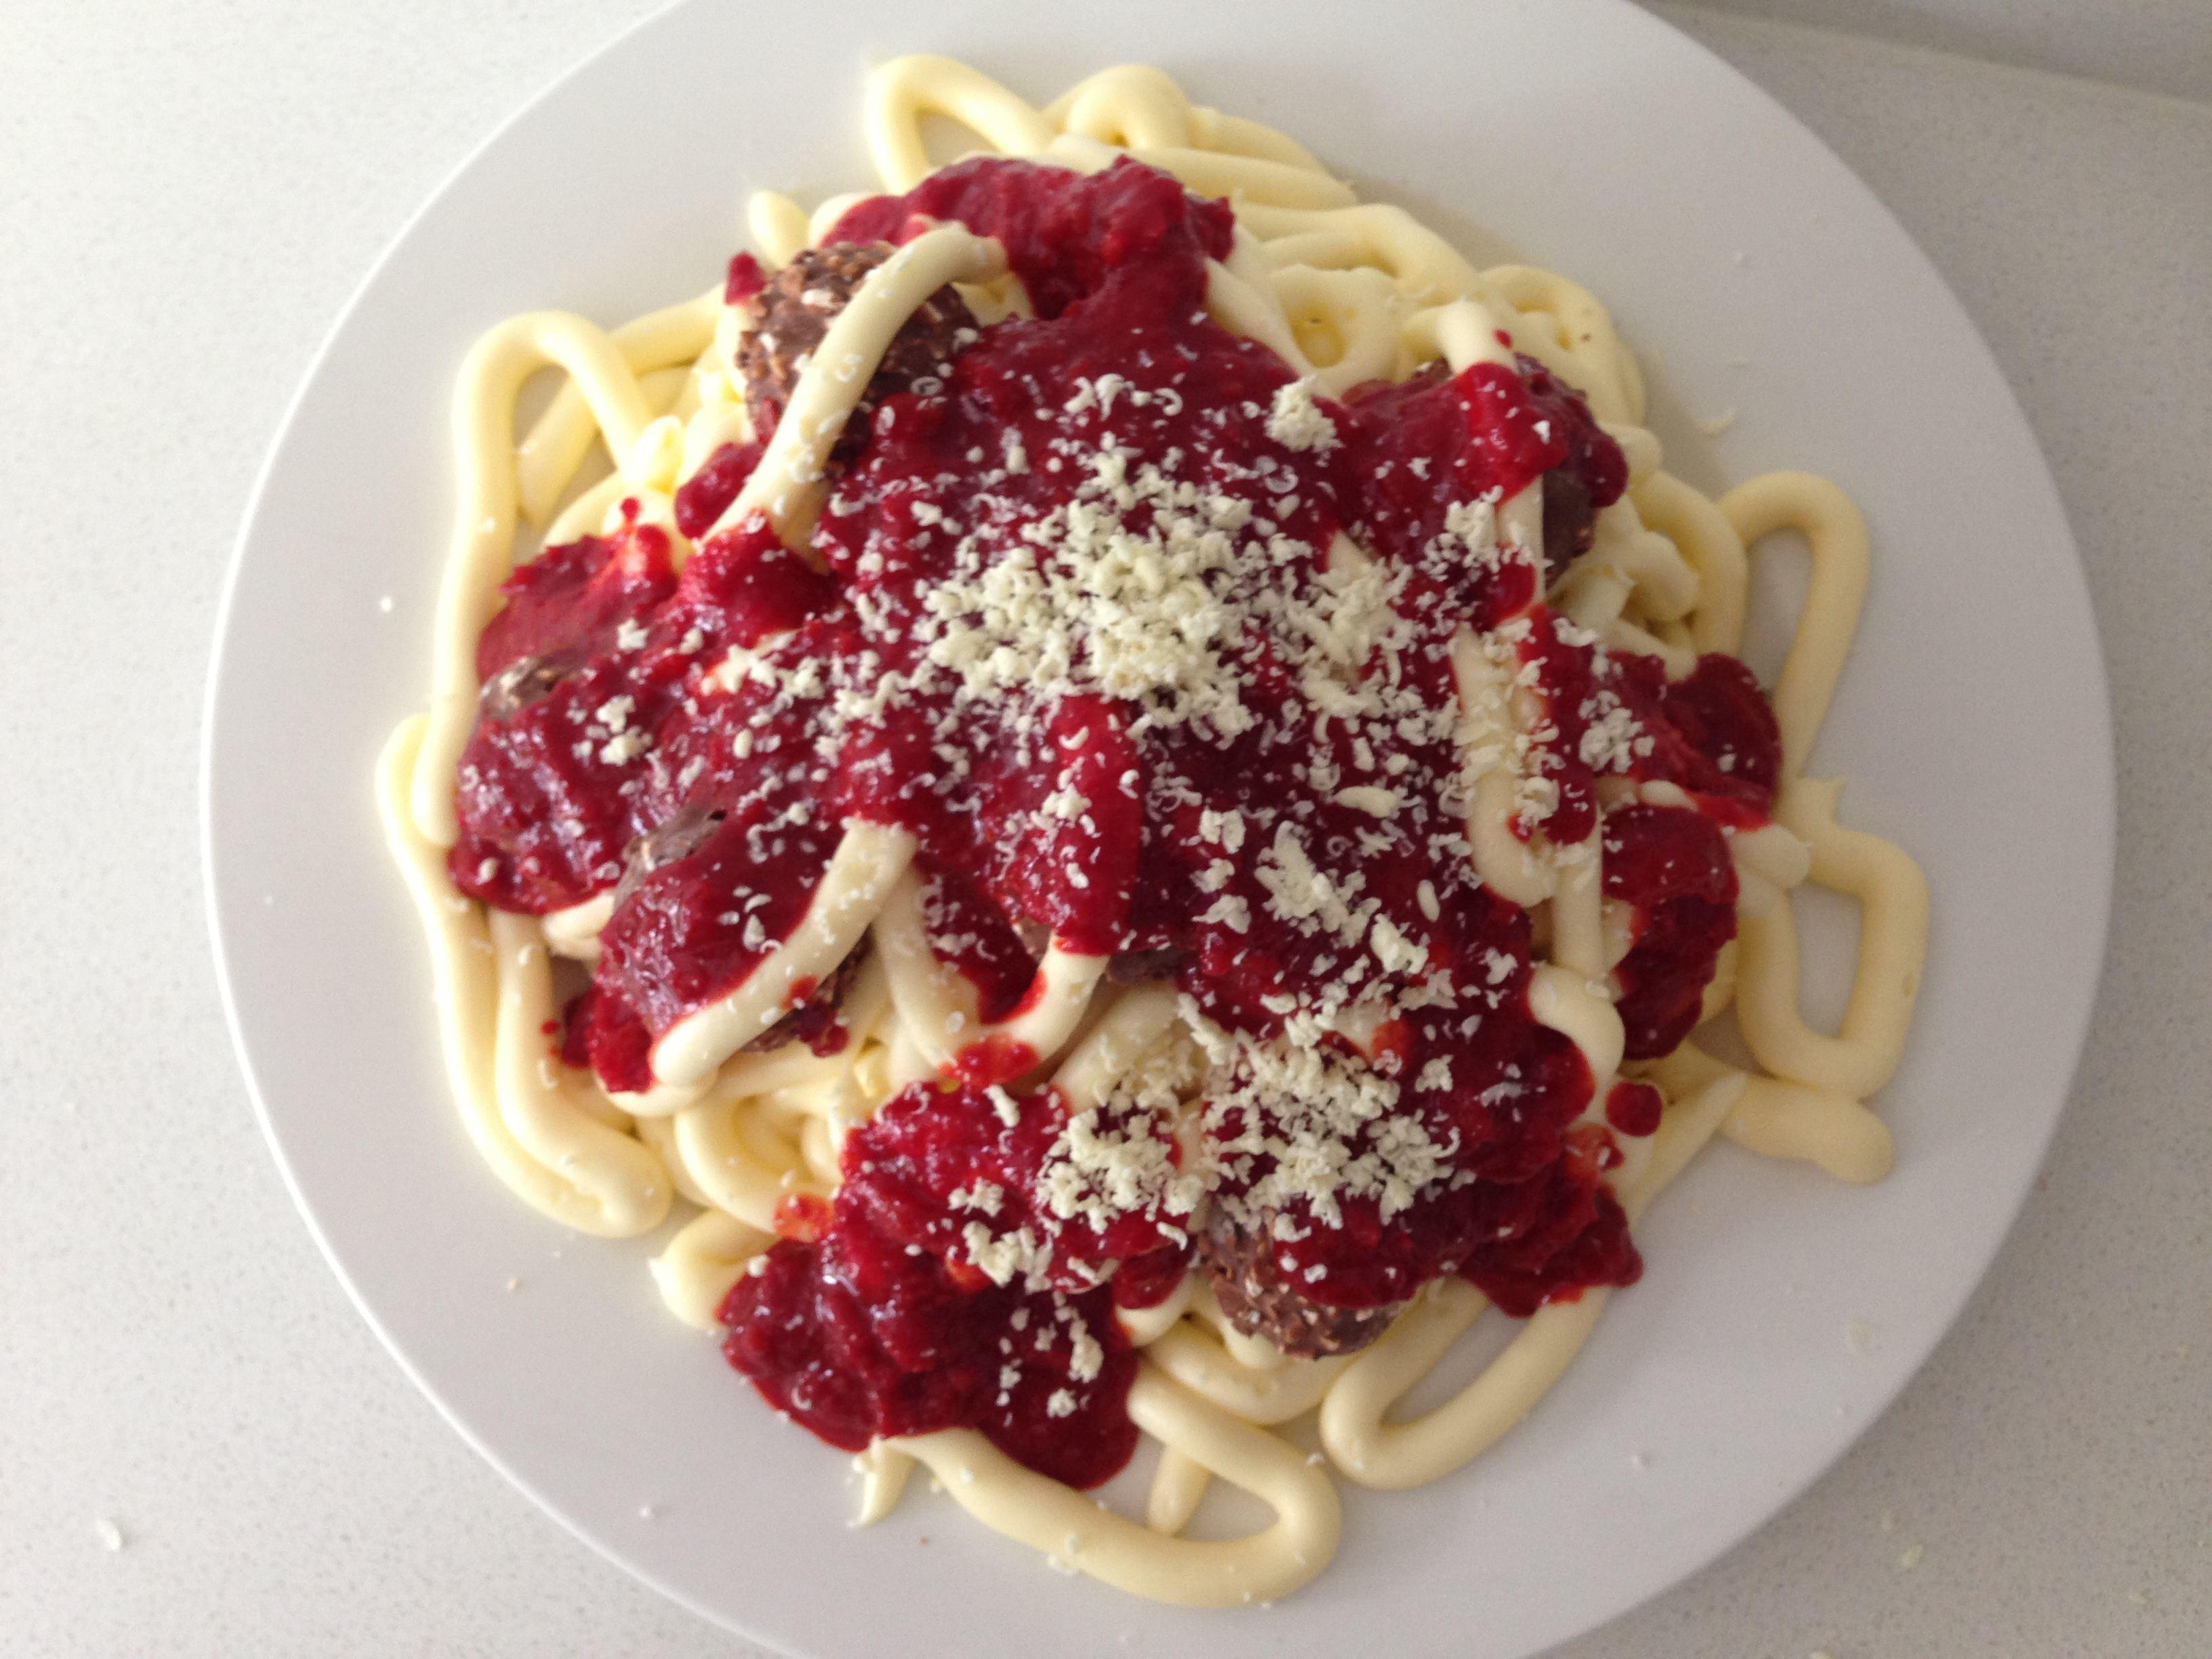 HowToCookThat : Cakes, Dessert & Chocolate | Spaghetti Birthday Cake ...